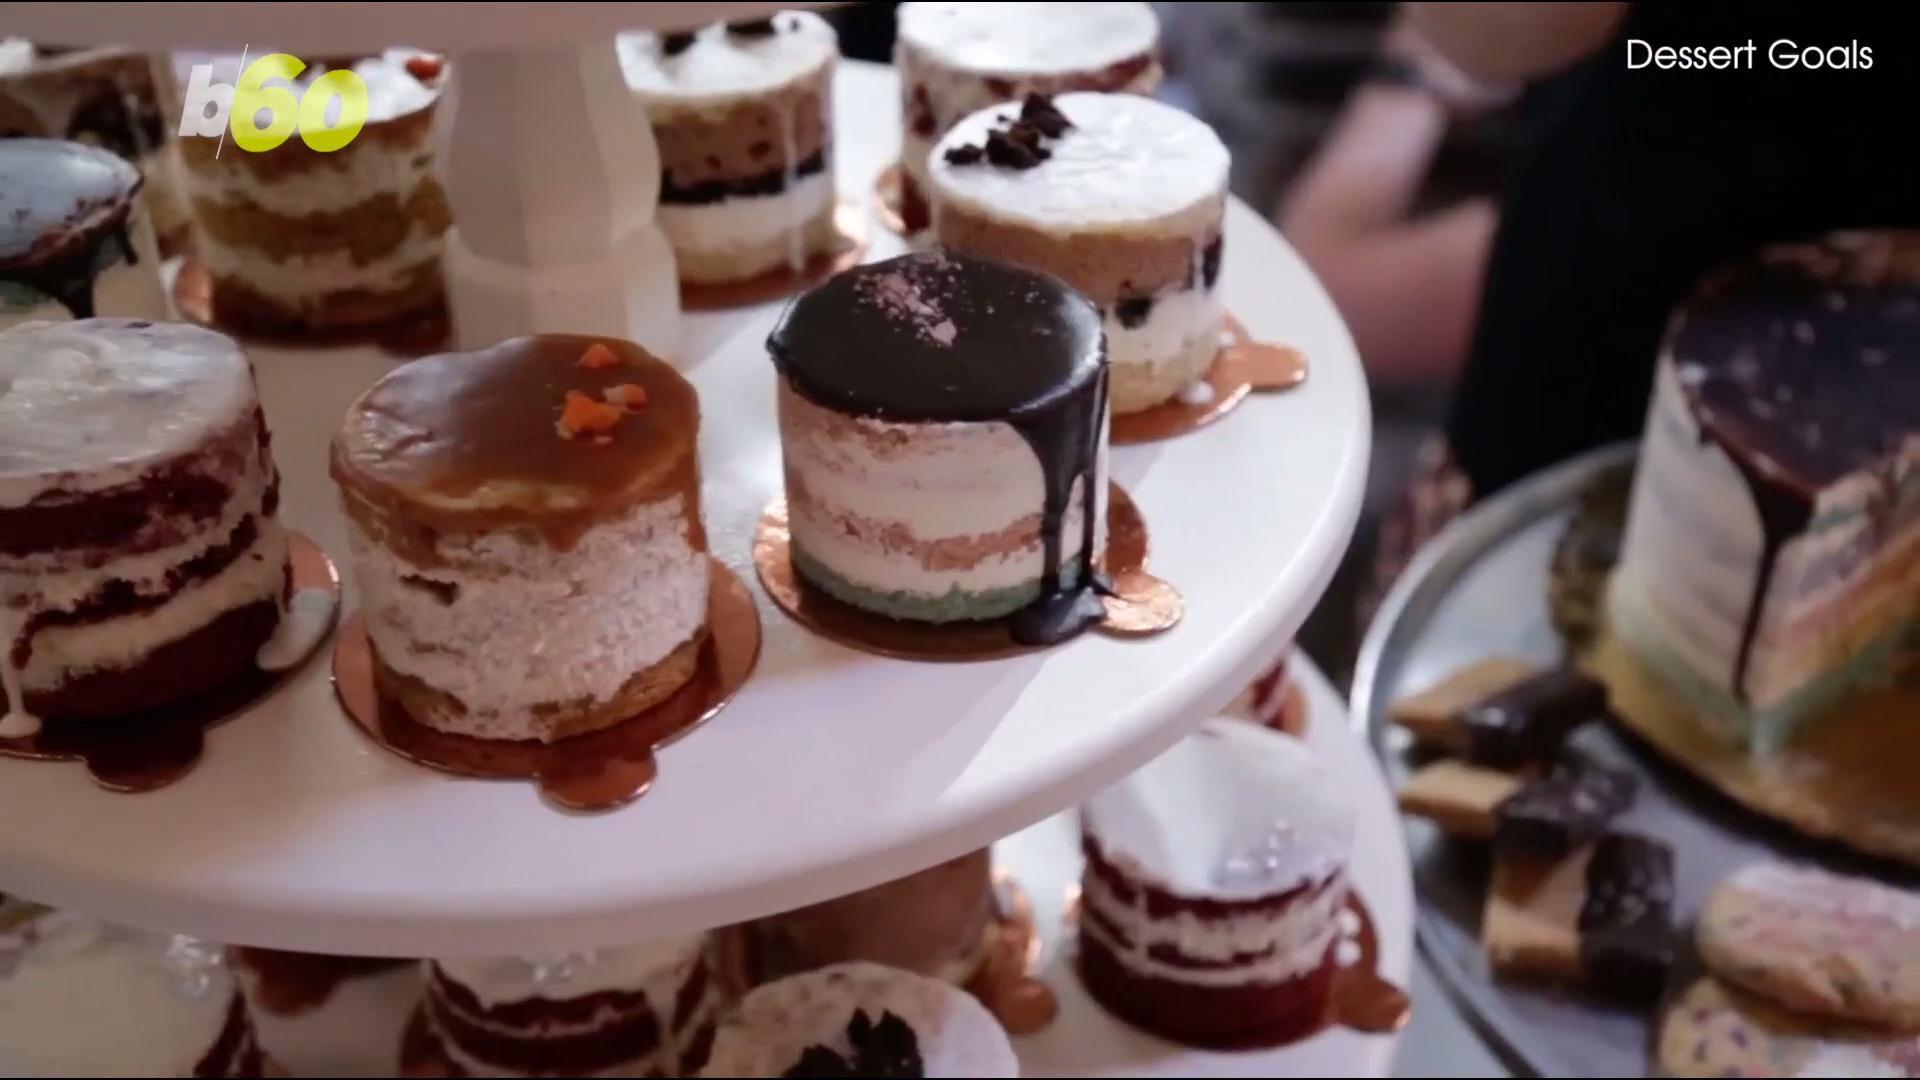 Is LA the New Dessert Capital of the U.S.?